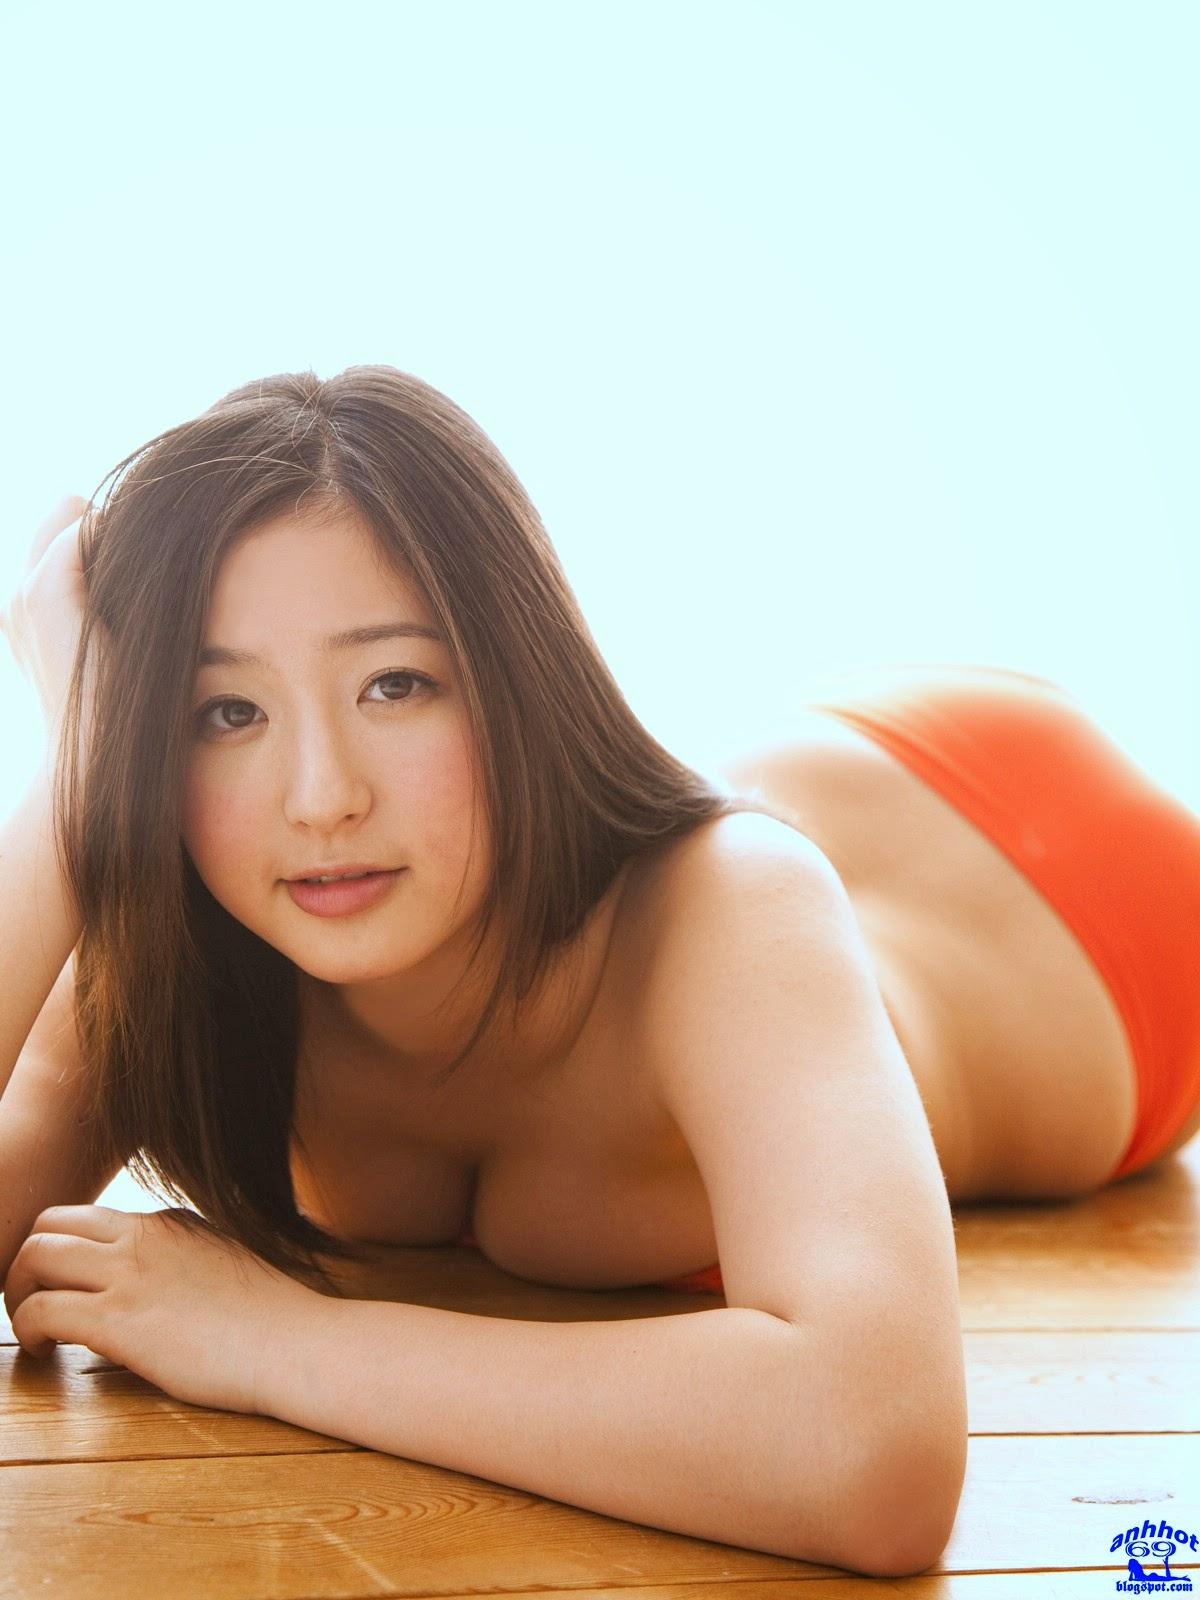 yuri-murakami-01844281